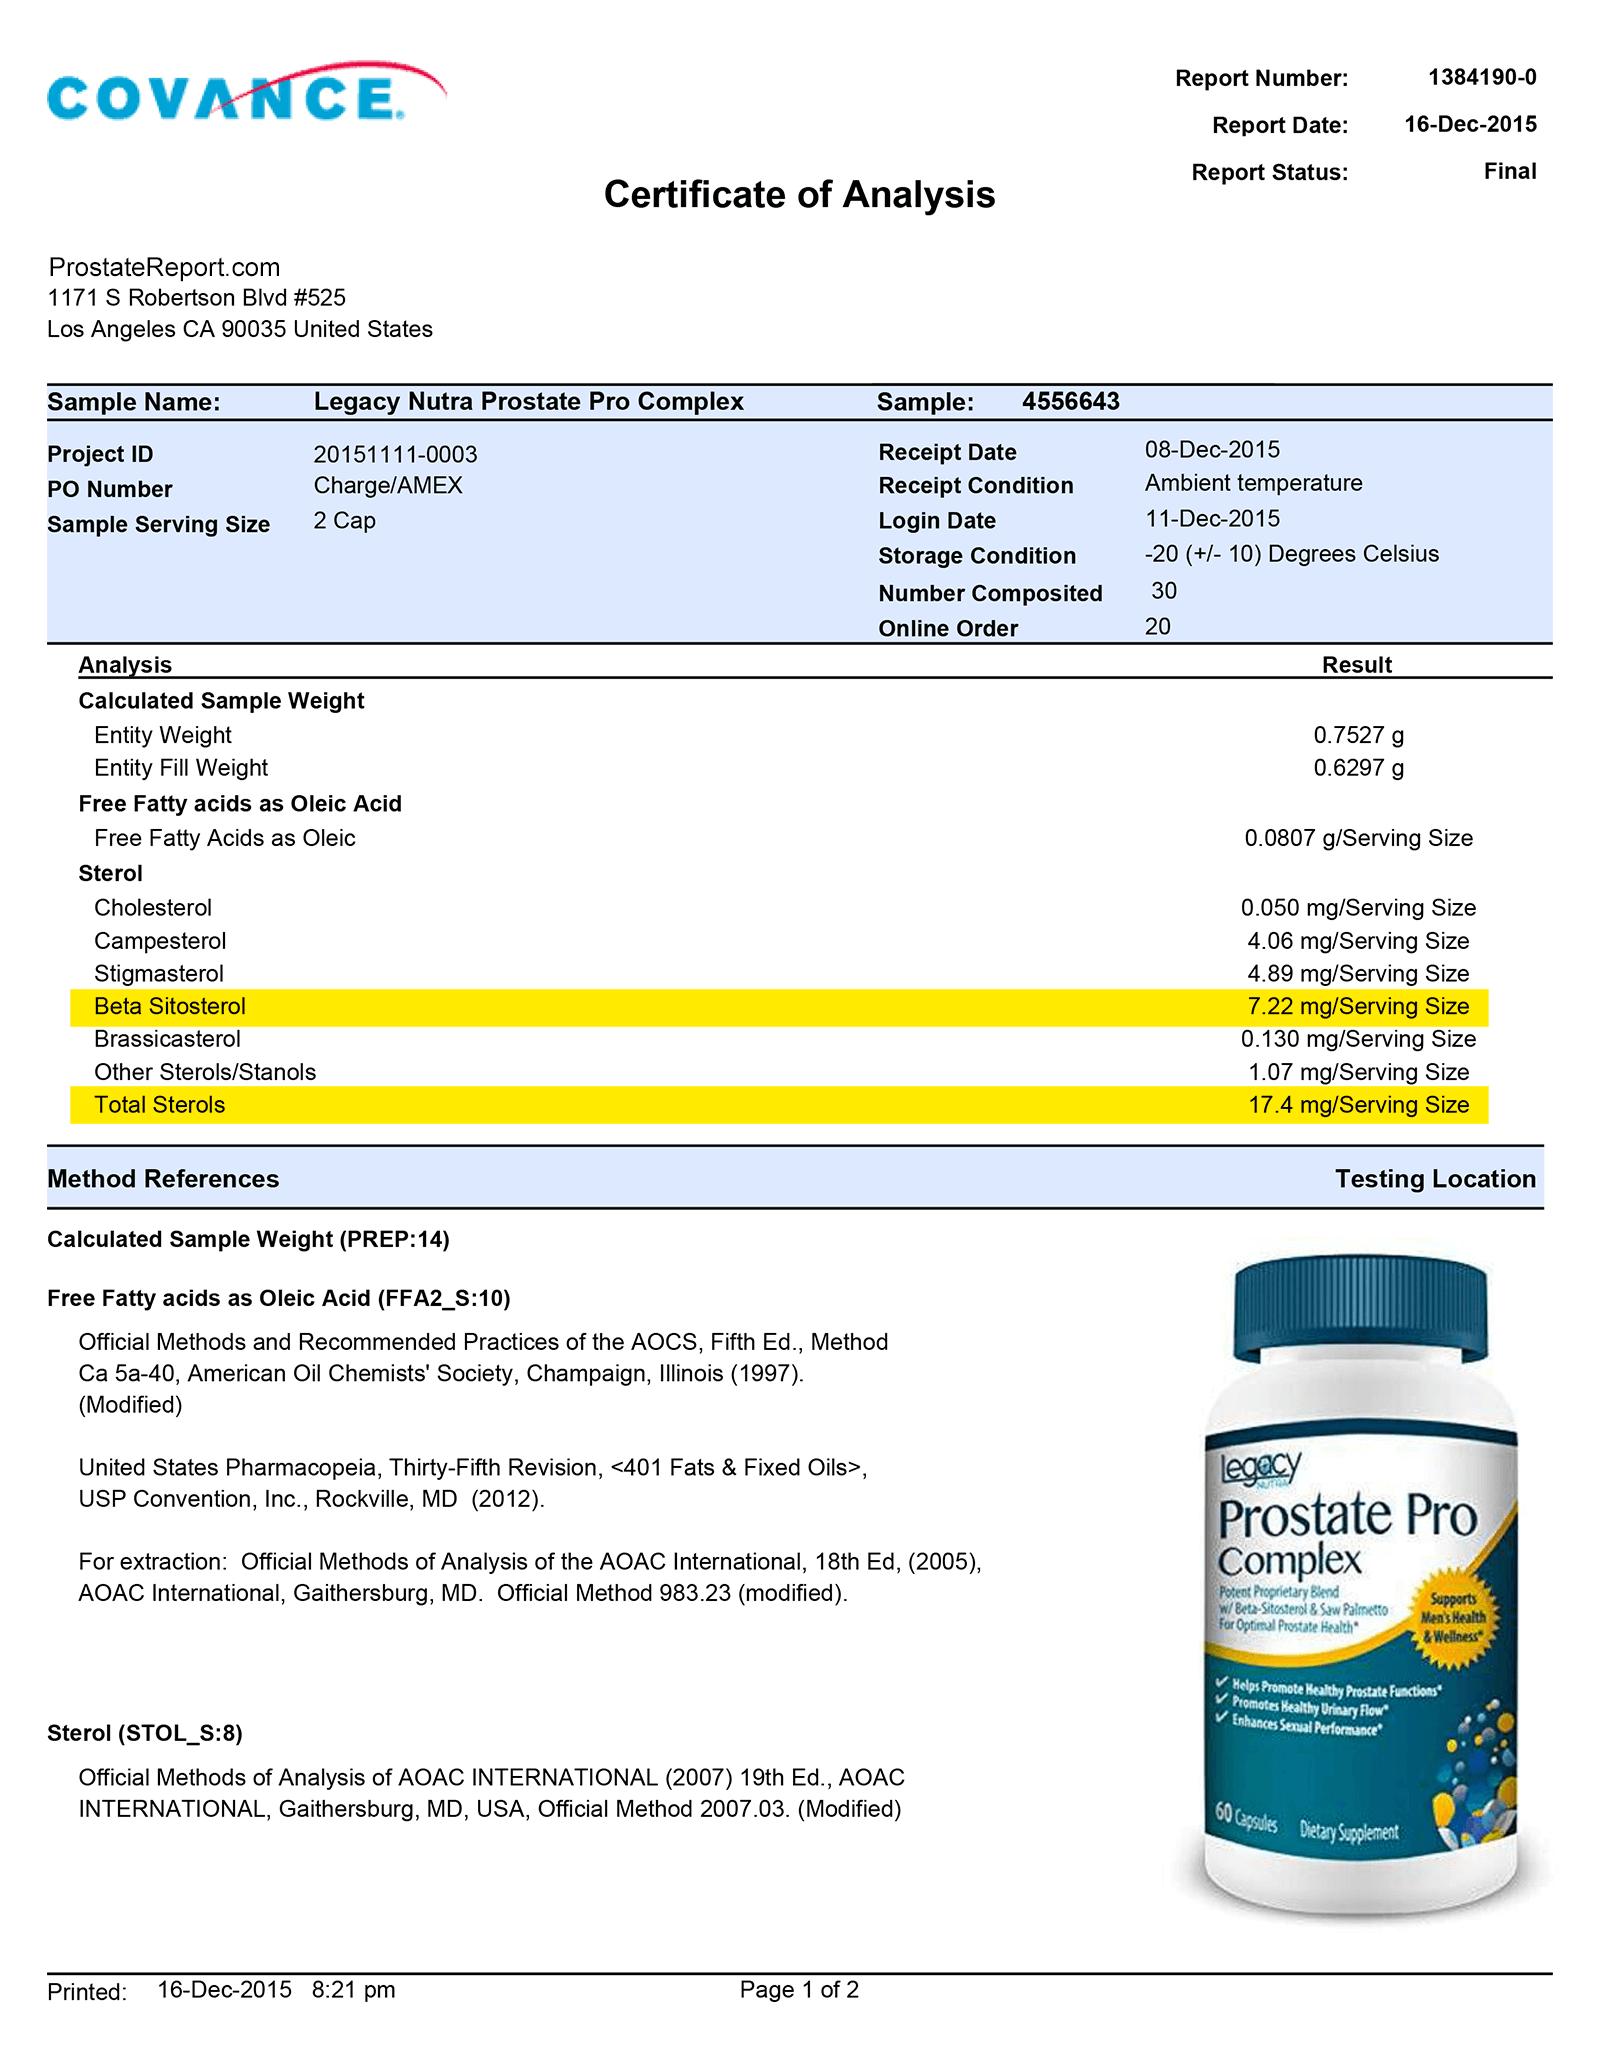 Prostate Pro Complex lab report